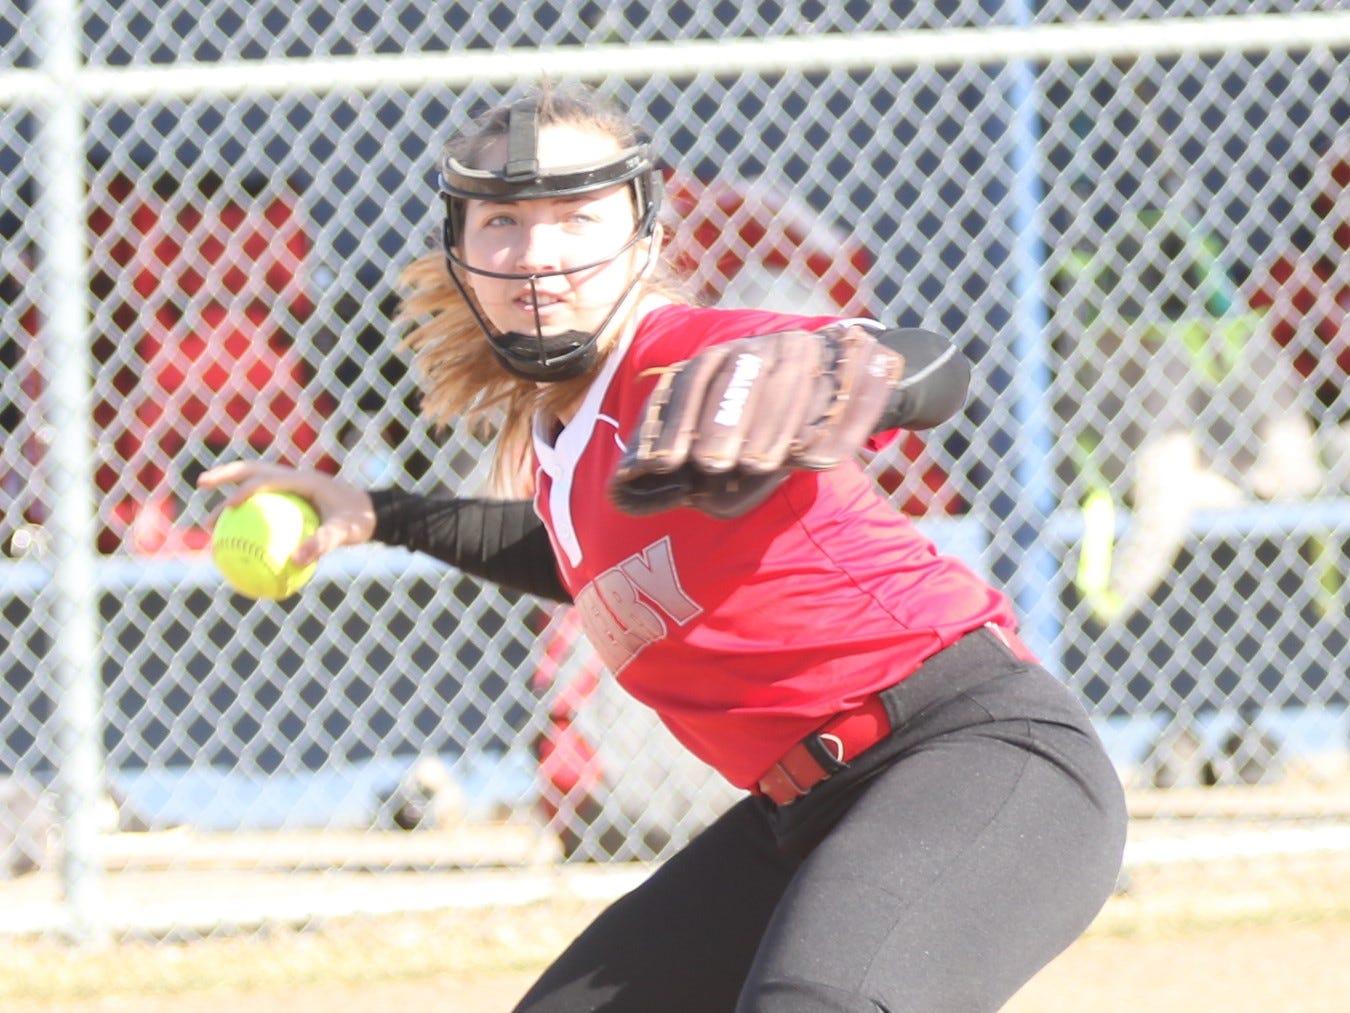 GALLERY: Shelby at Ontario Softball